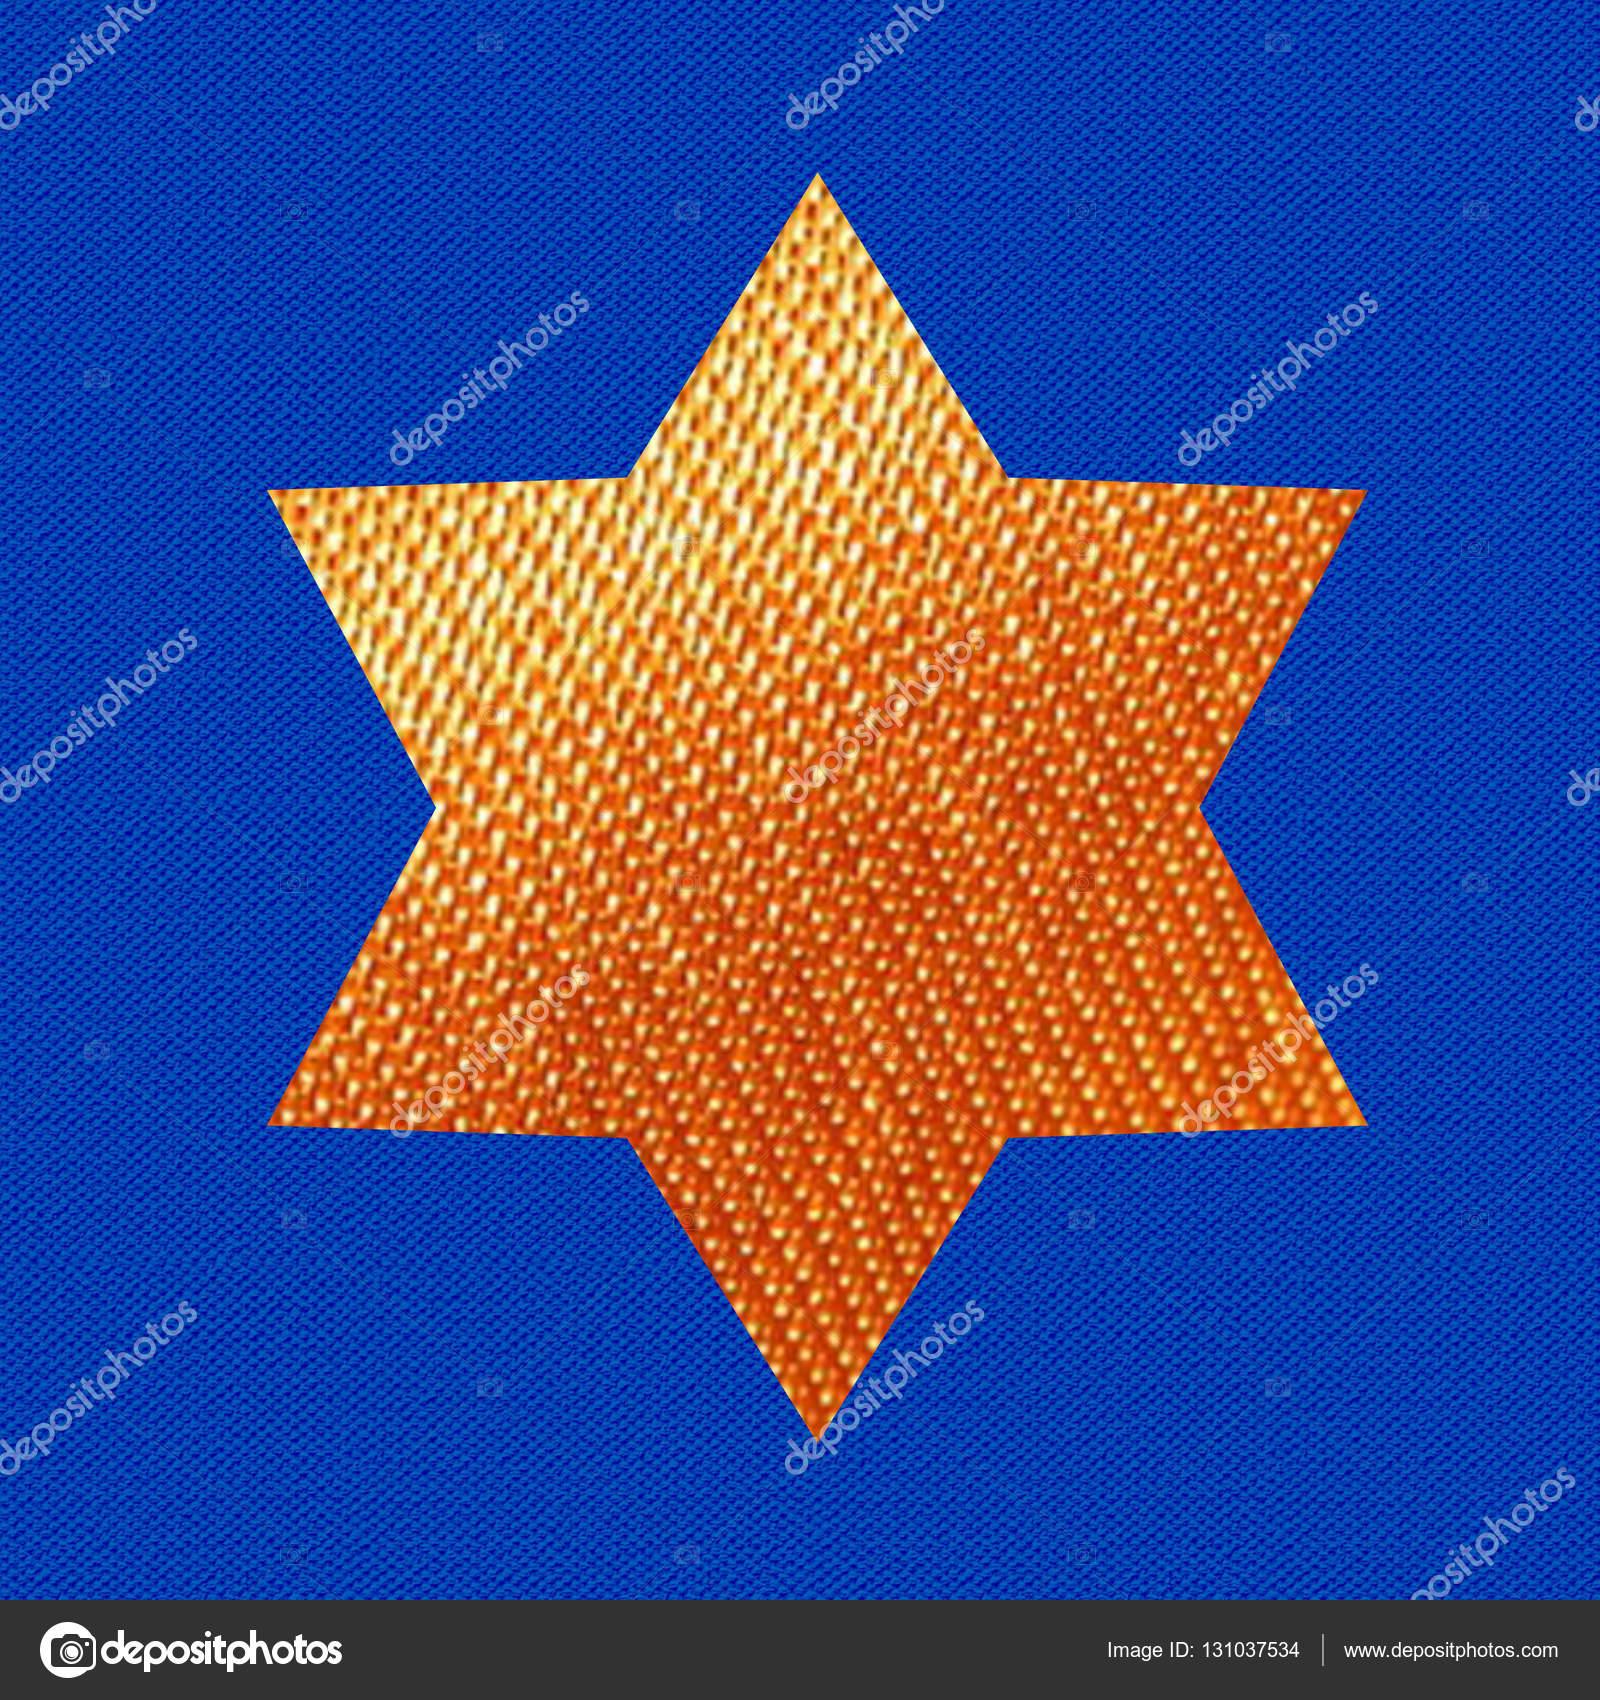 Star of David on blue background. David stars banner. Jewish Holiday stars. Gold stars wallpaper. Israel symbol. Fabric texture. Hanukkah Jewish Holiday ...